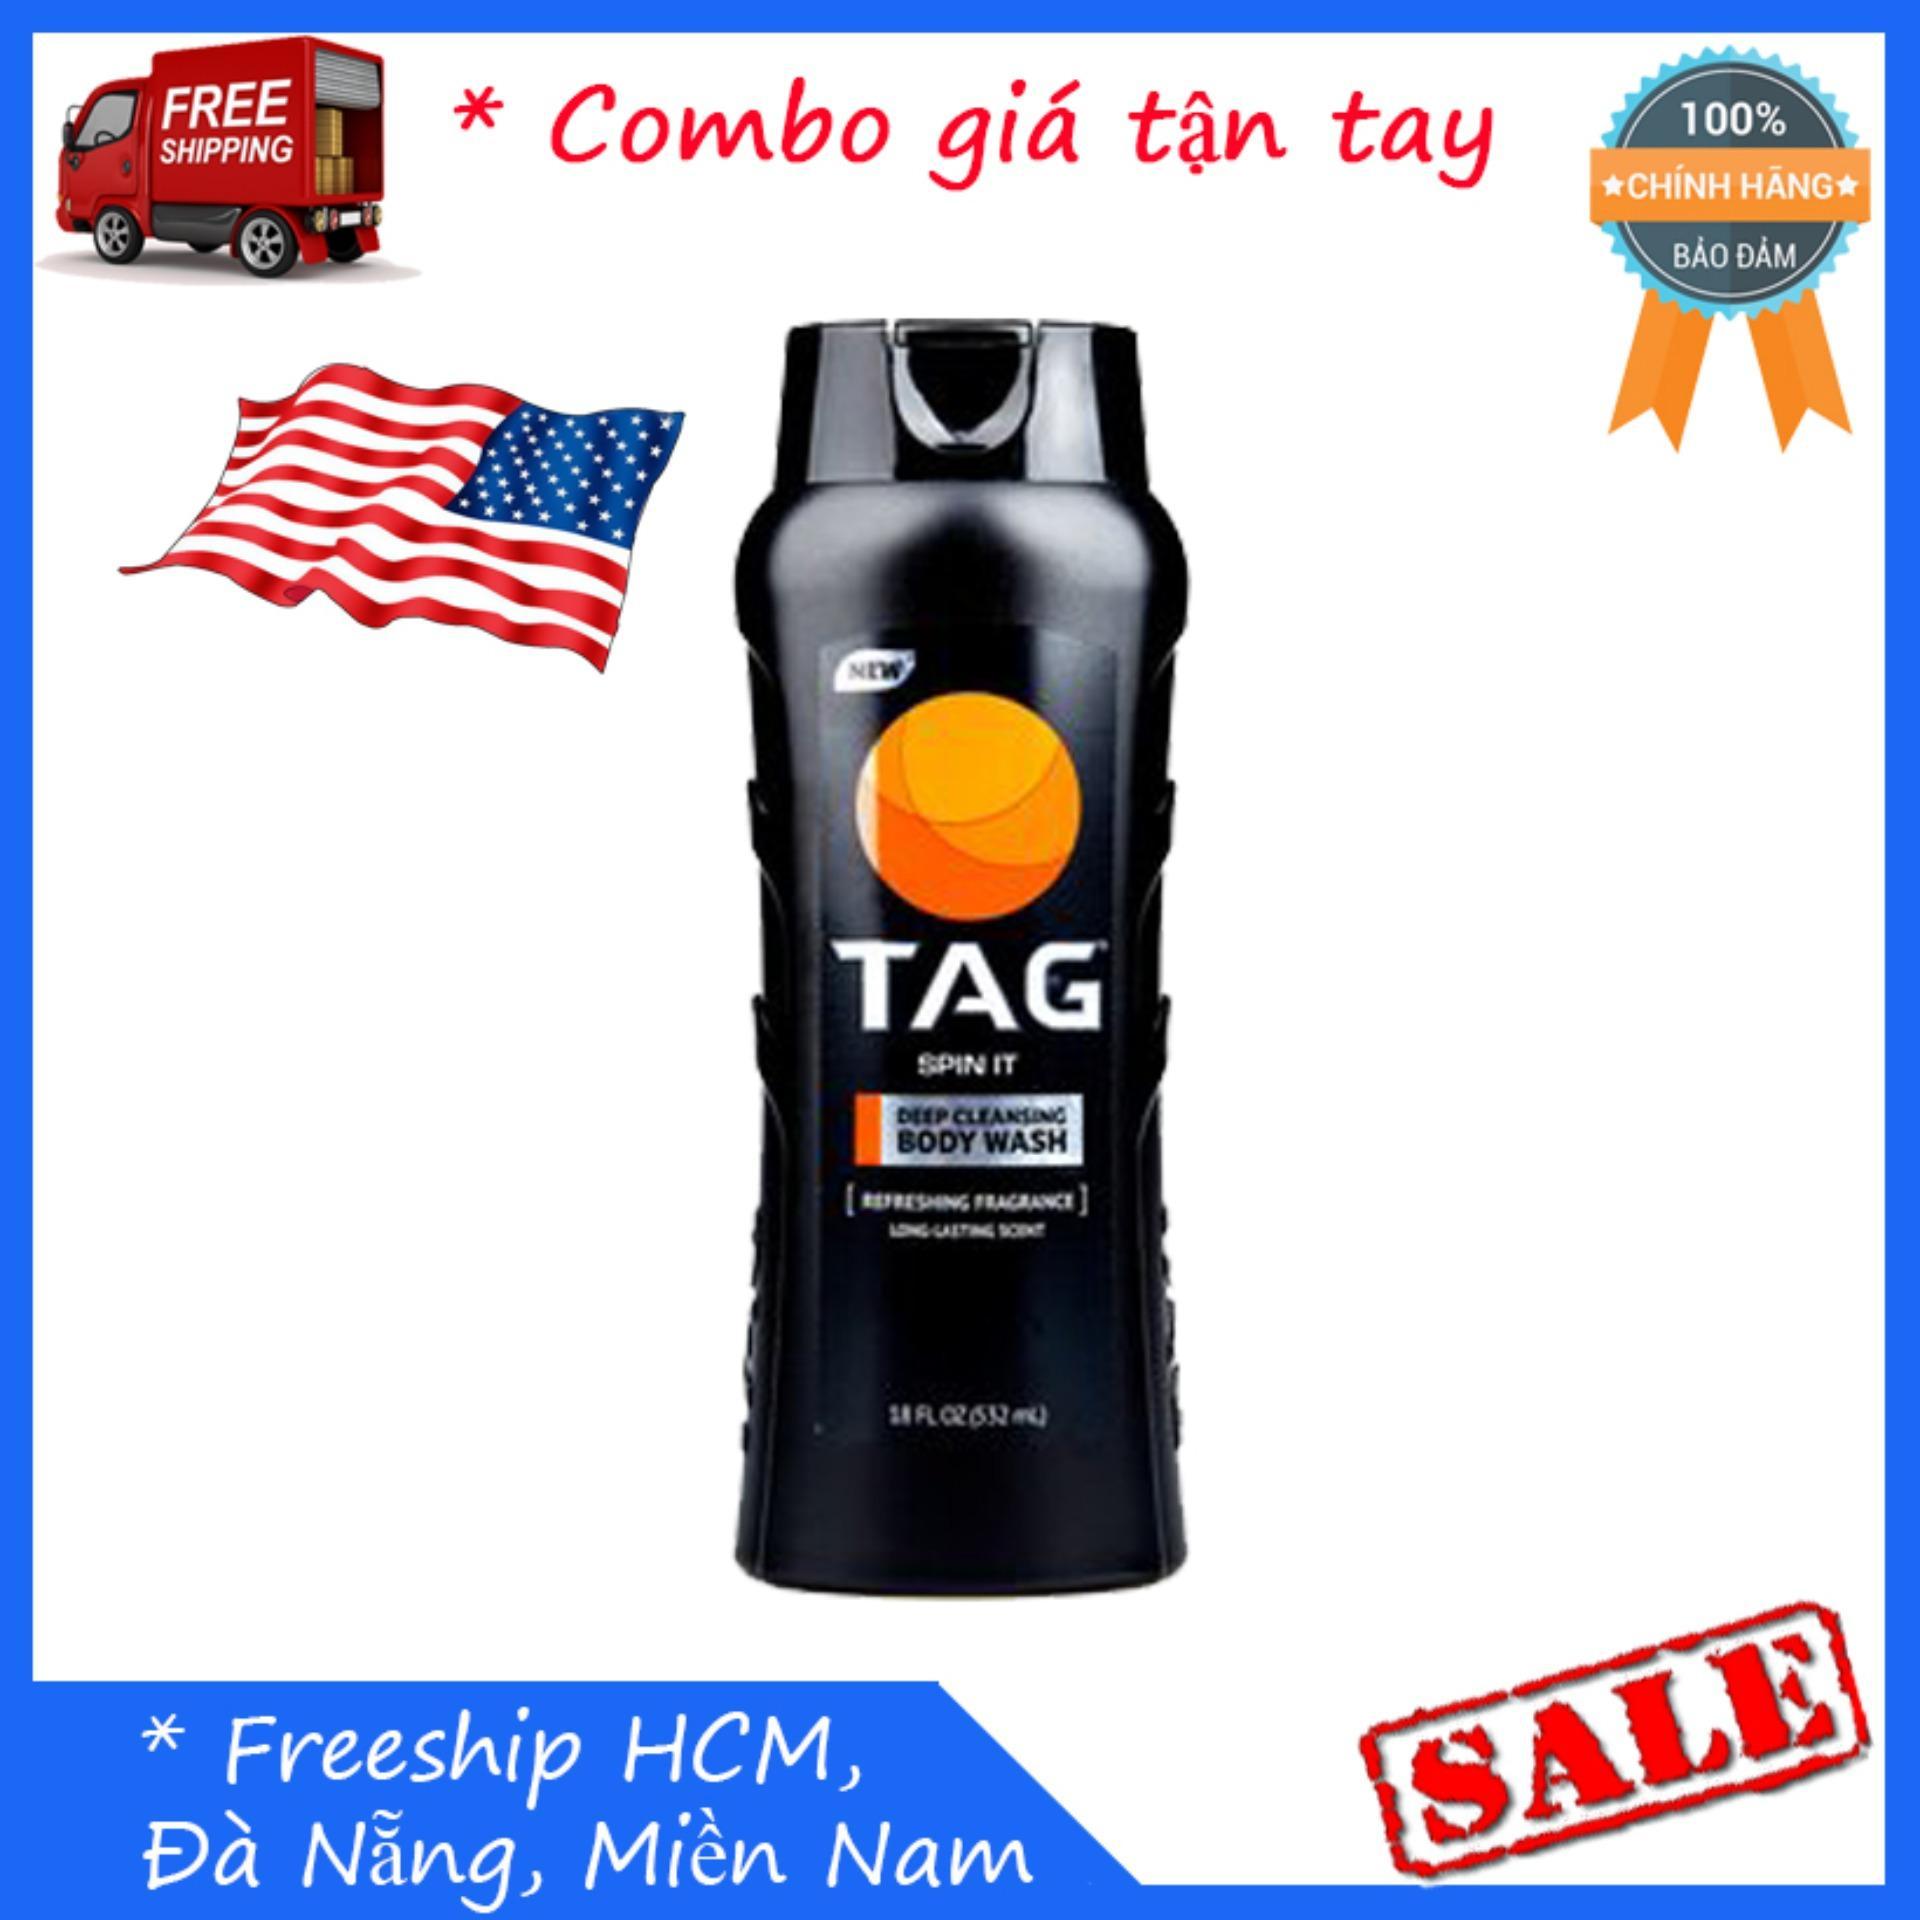 Sữa tắm Nam TAG Body Wash, Spin It  532ml cao cấp